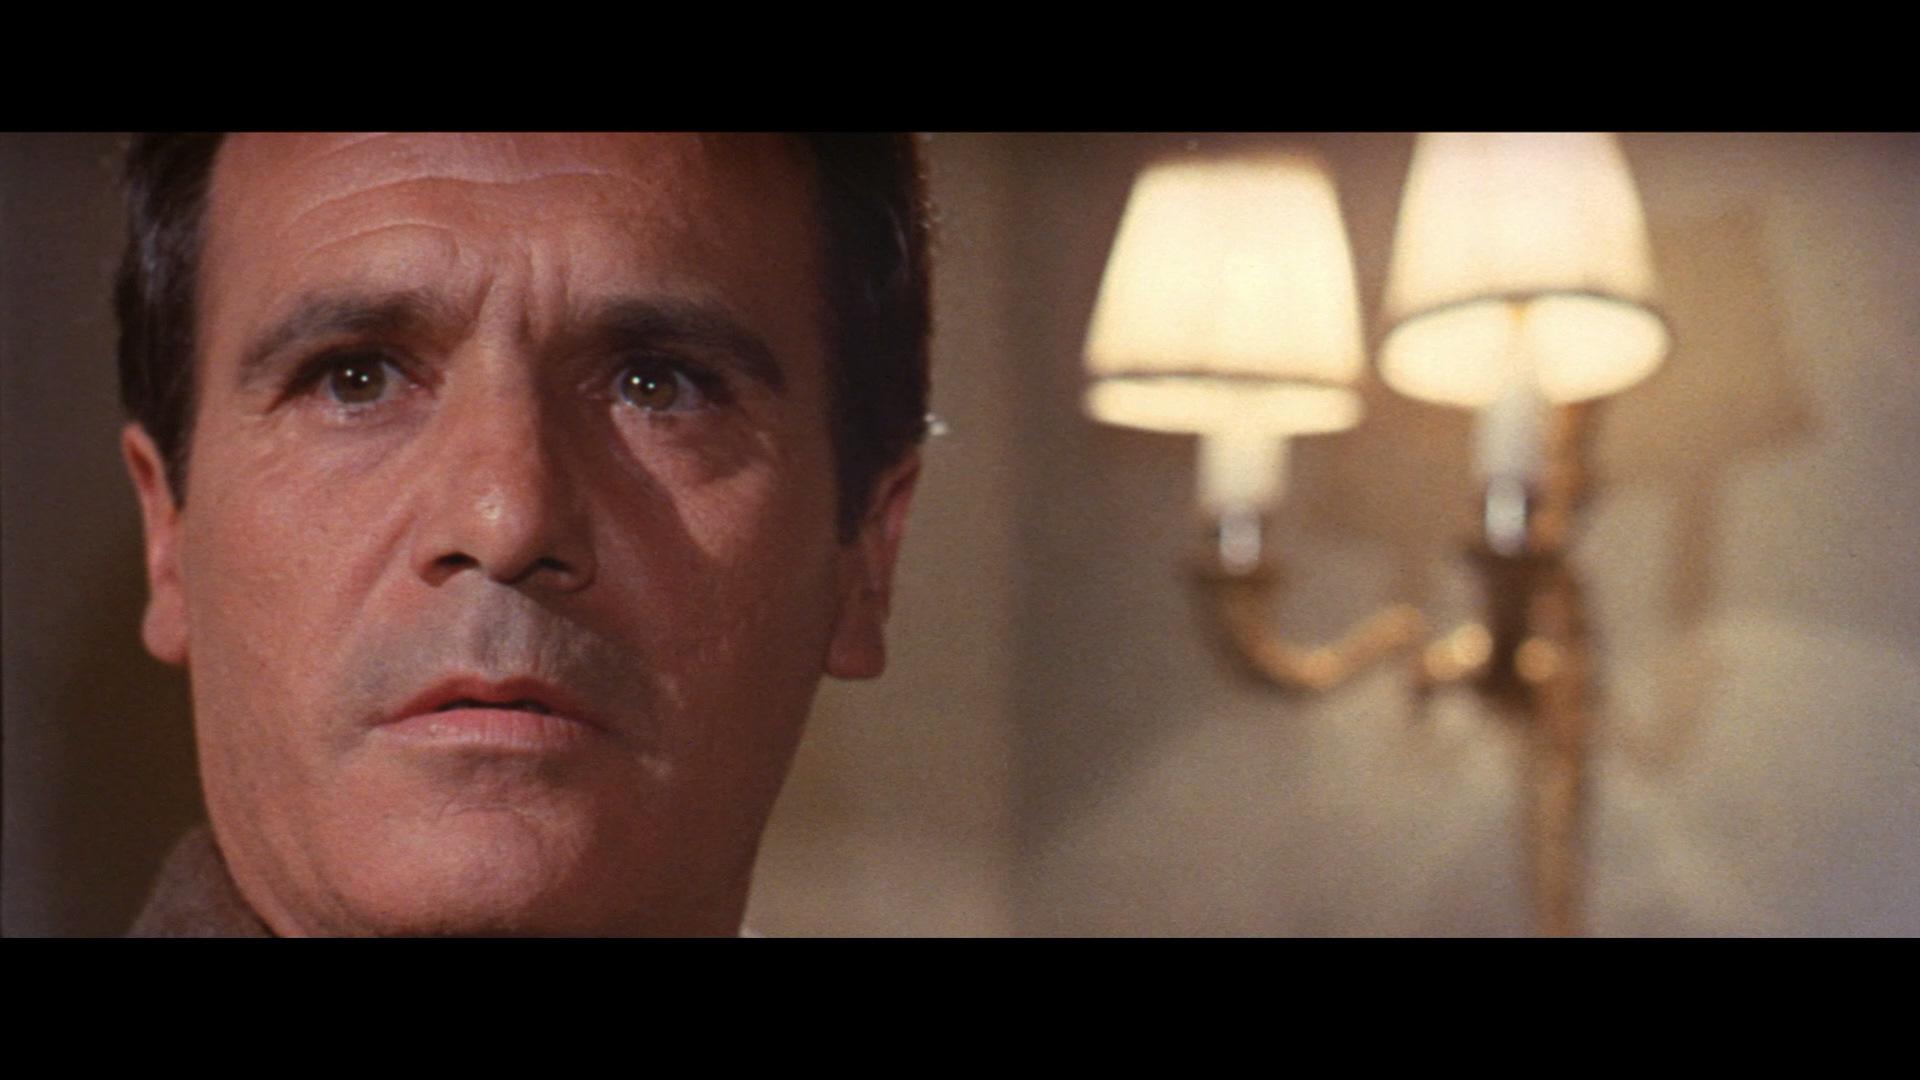 Francisco Rabal in La battaglia d'Inghilterra (1969)